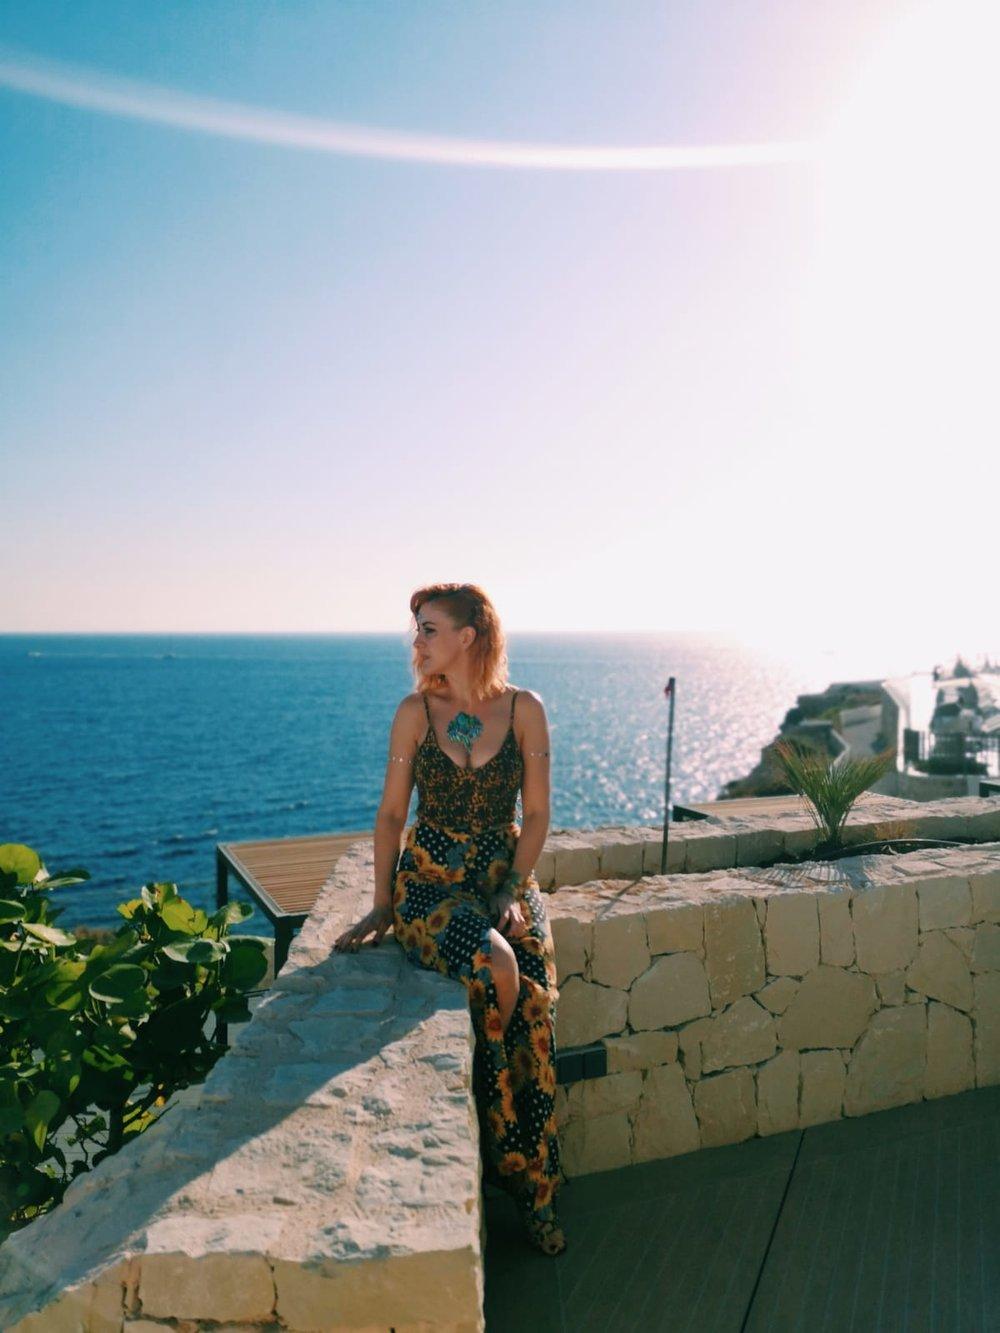 Shot during golden hour at  7 Pines Resort Ibiza